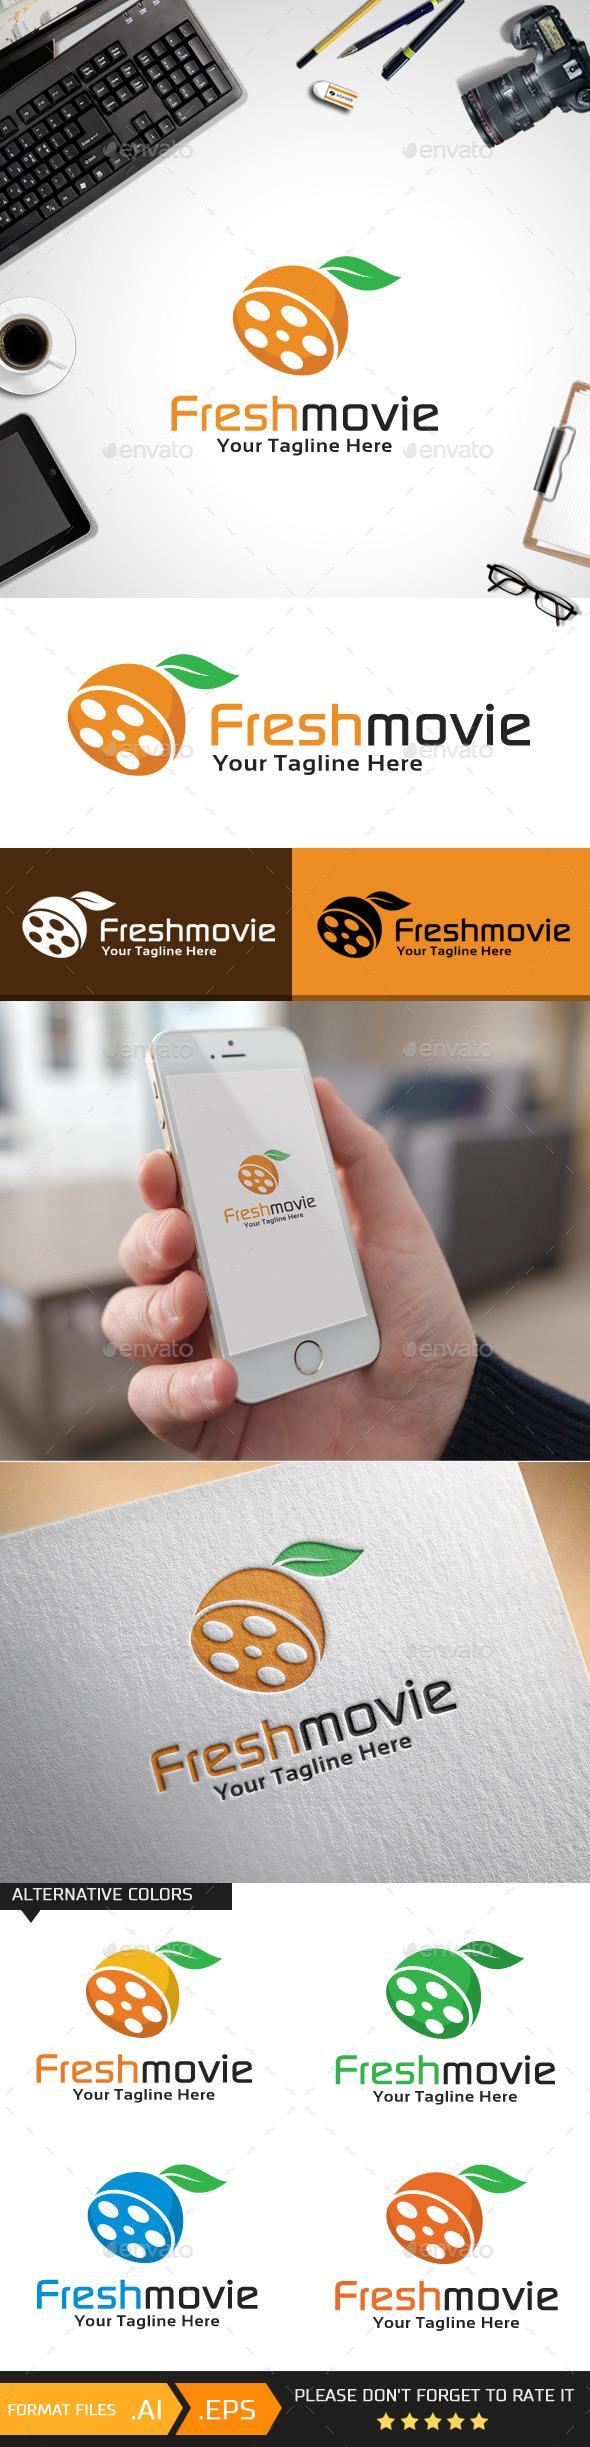 Freshmovie Logo Template - Objects Logo Templates